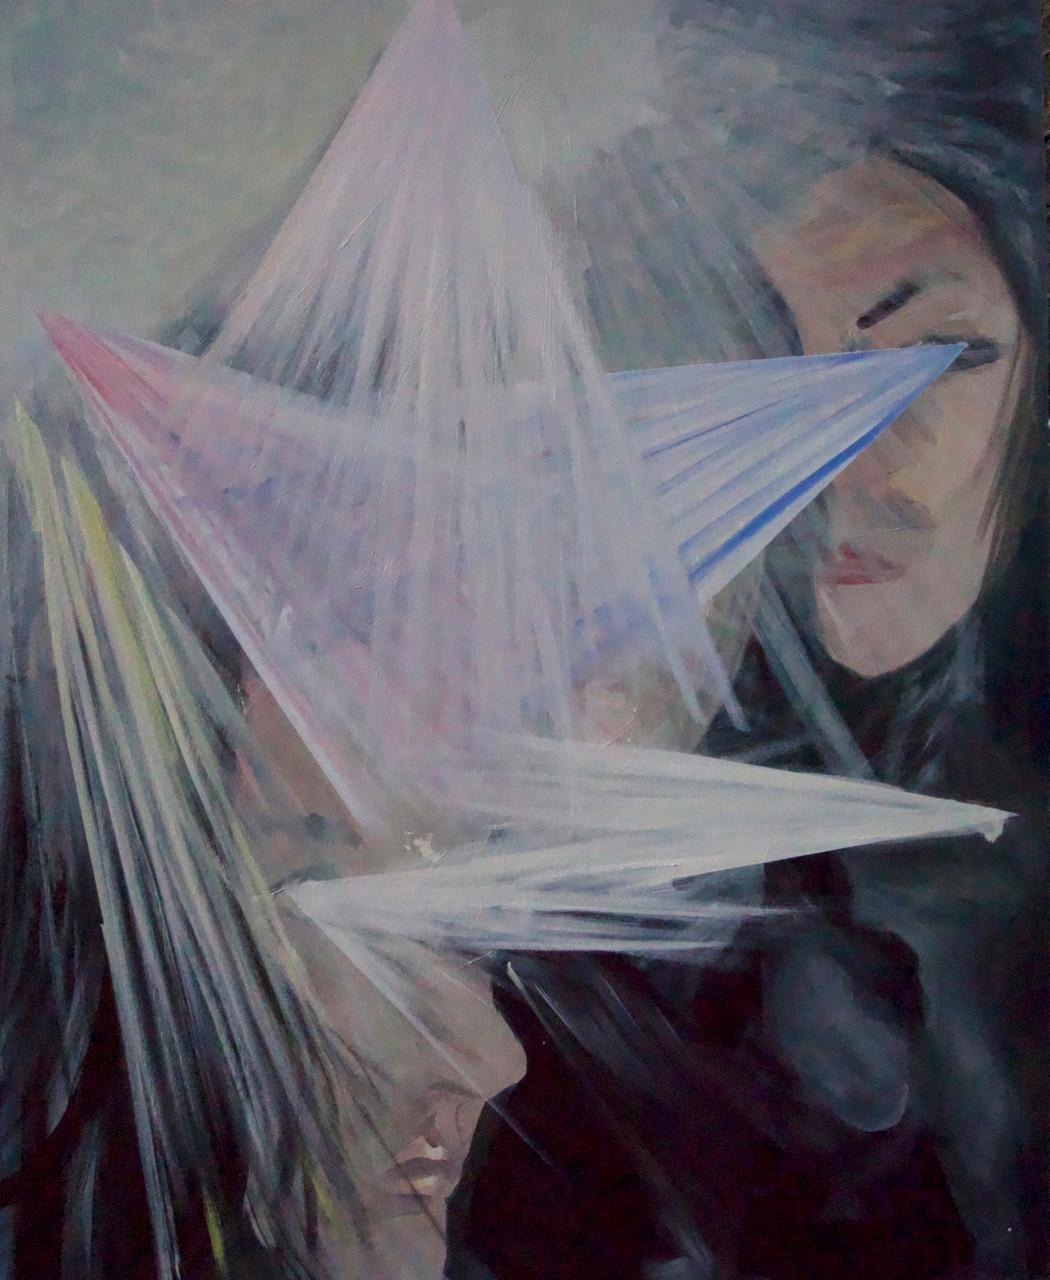 white mountain, 31x38inches, oil on canvas, 2020